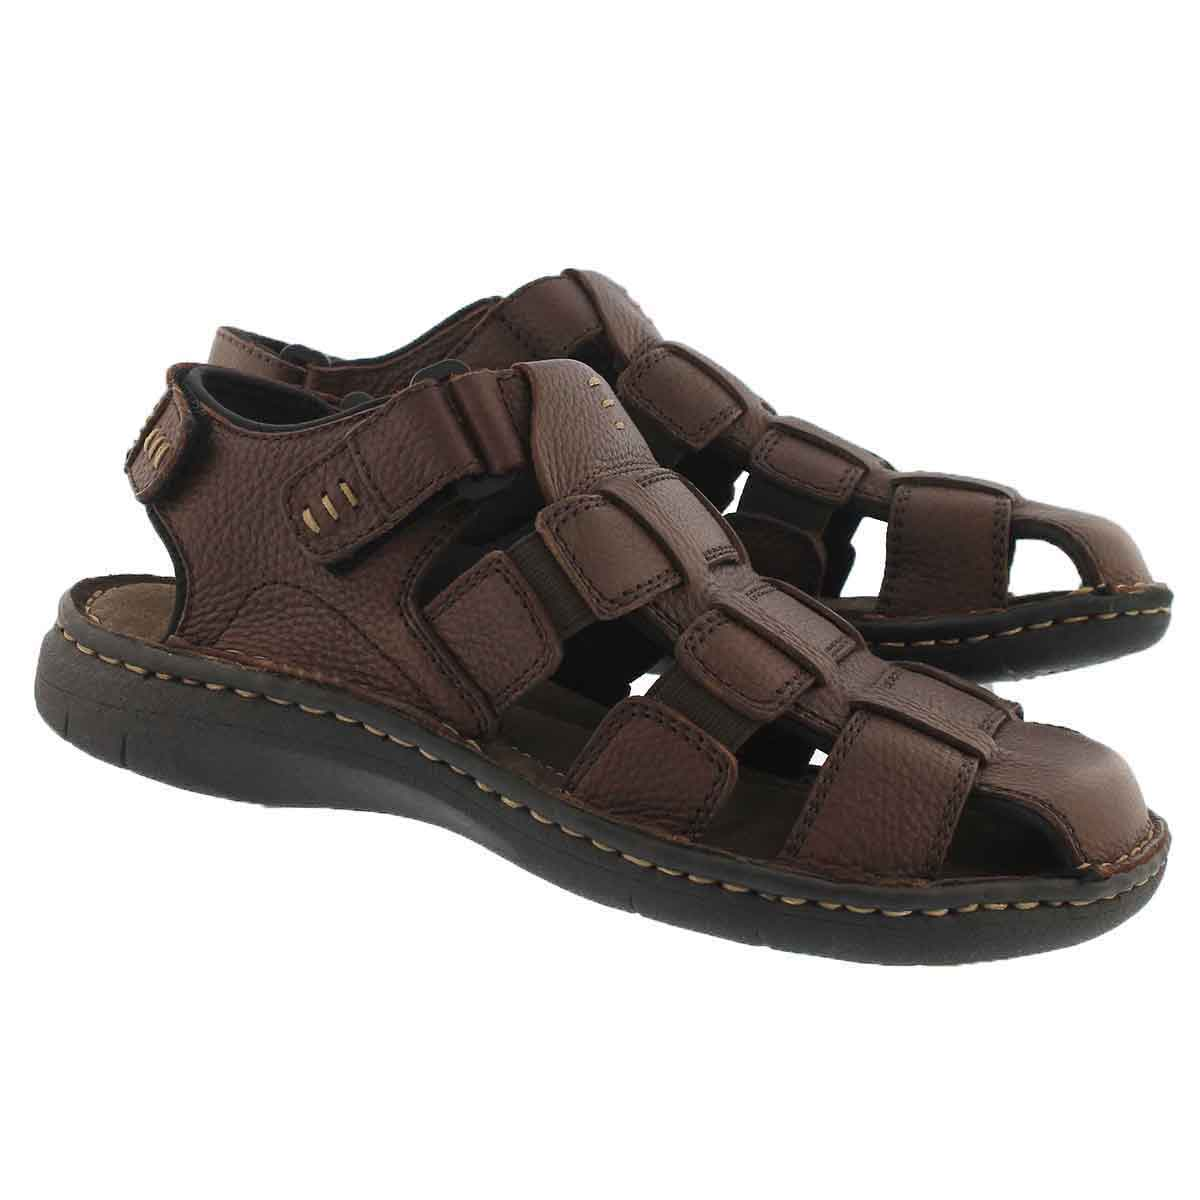 Mns Charles 4 brown fisherman sandal